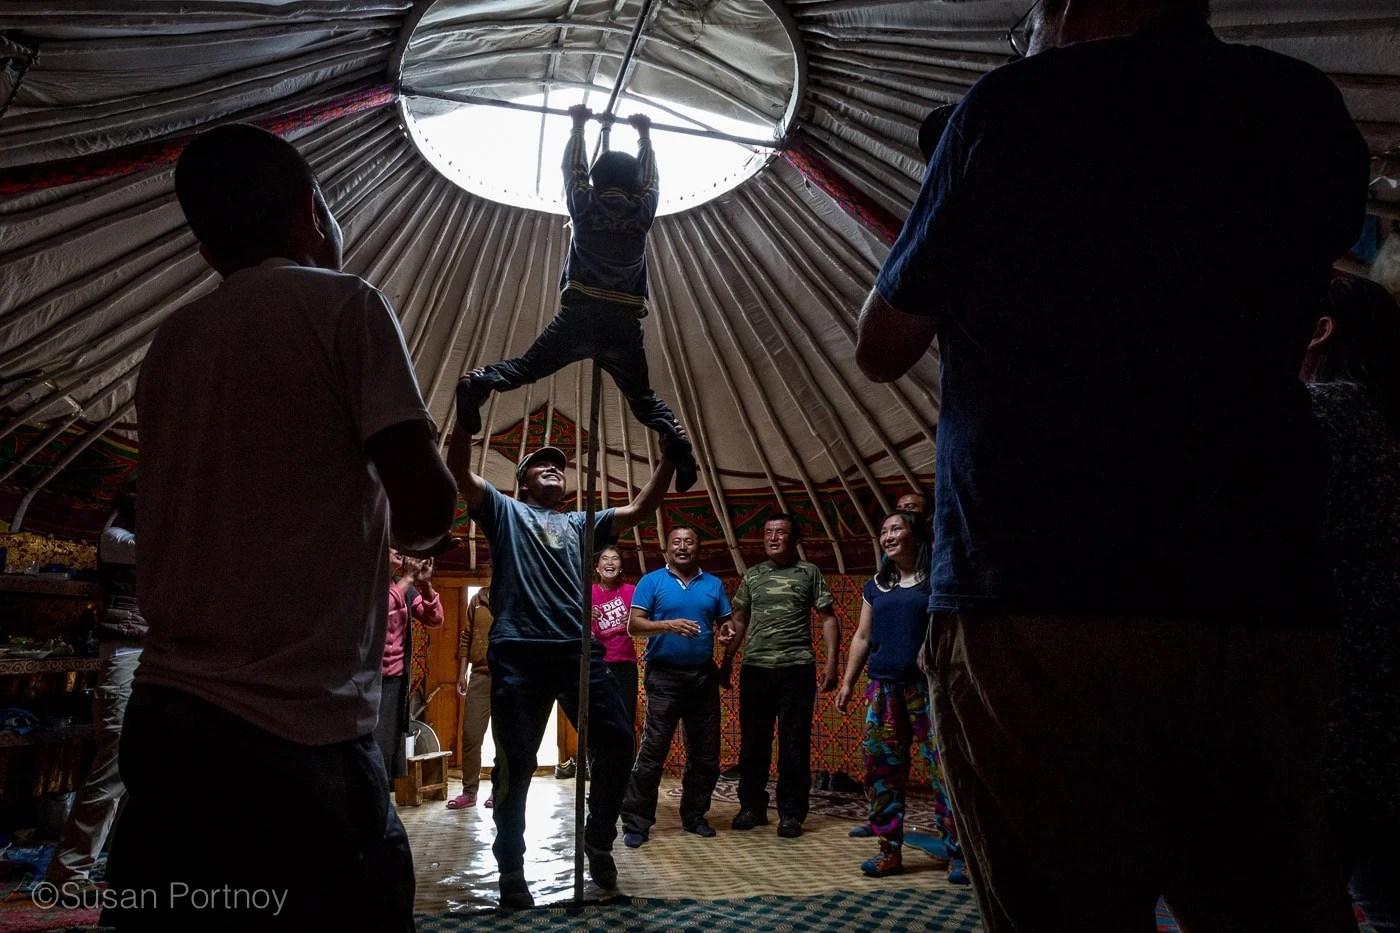 A boy climbs the pole of a ger at a Kazakh Mongolian Dance Party - The Insatiable Traveler